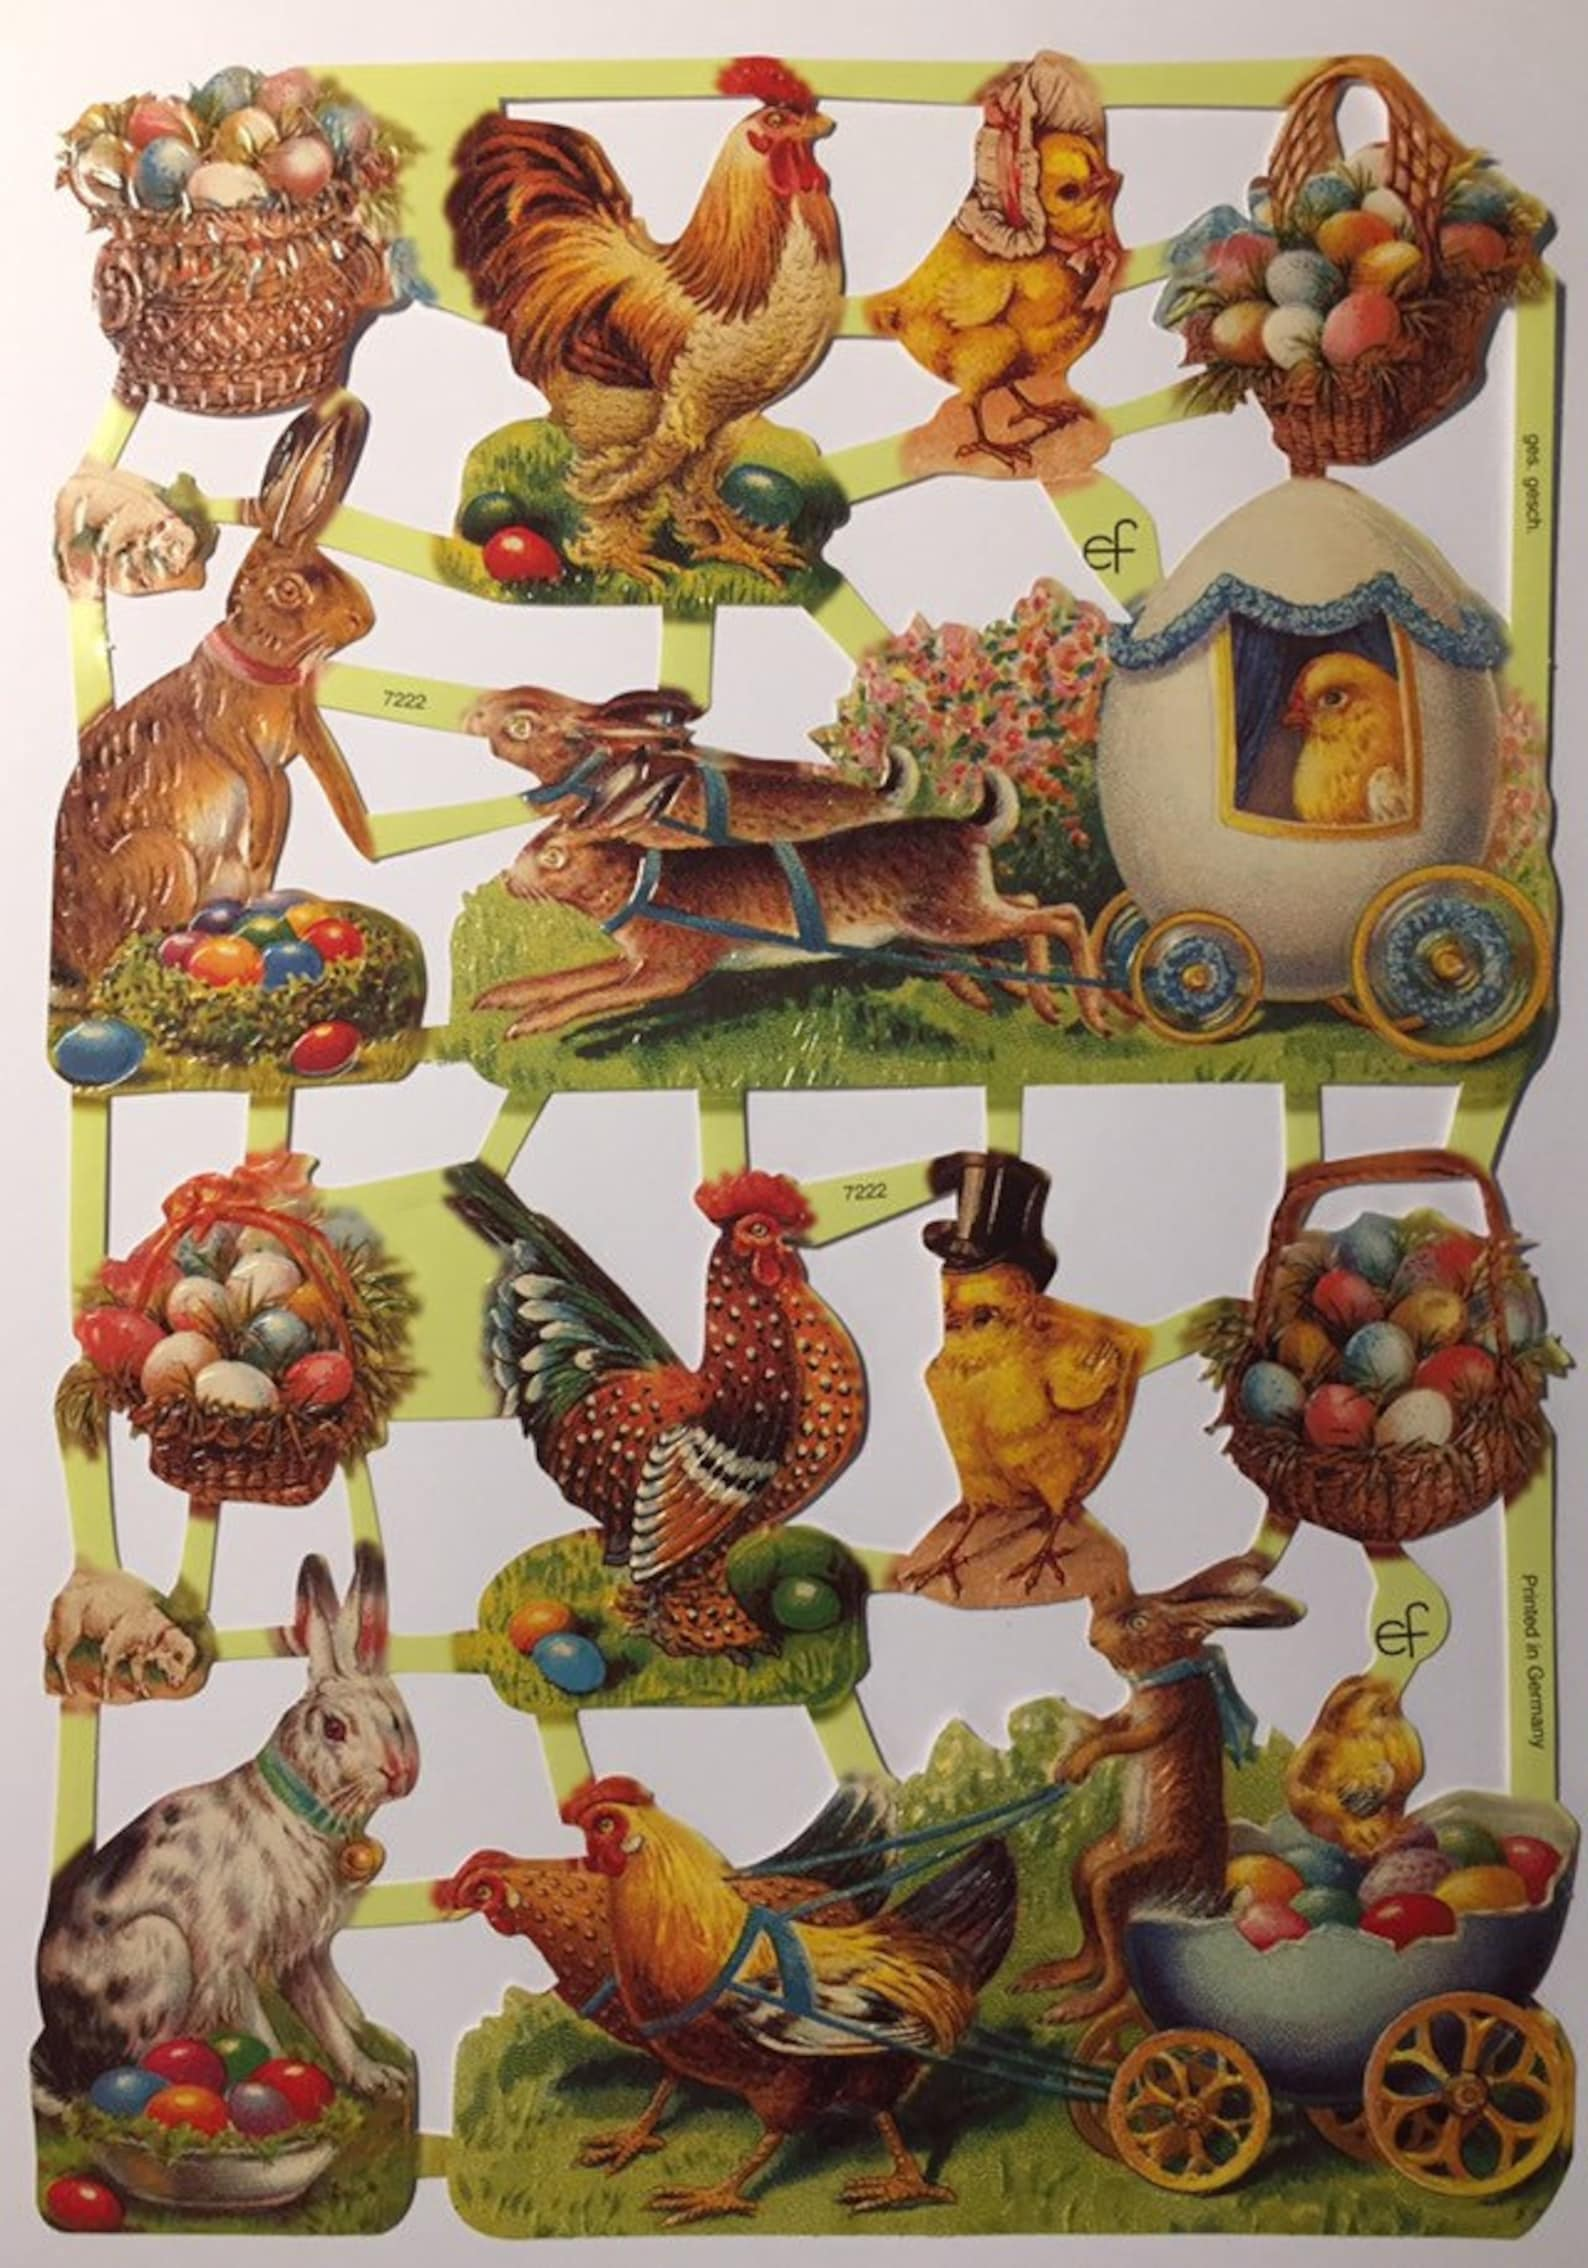 SCRAP RELIEFS Vintage Easter Glanzbilder (1 sheet) #7222 Embossed Die Cuts - Ernst Freihoff GmbH Made in Germany